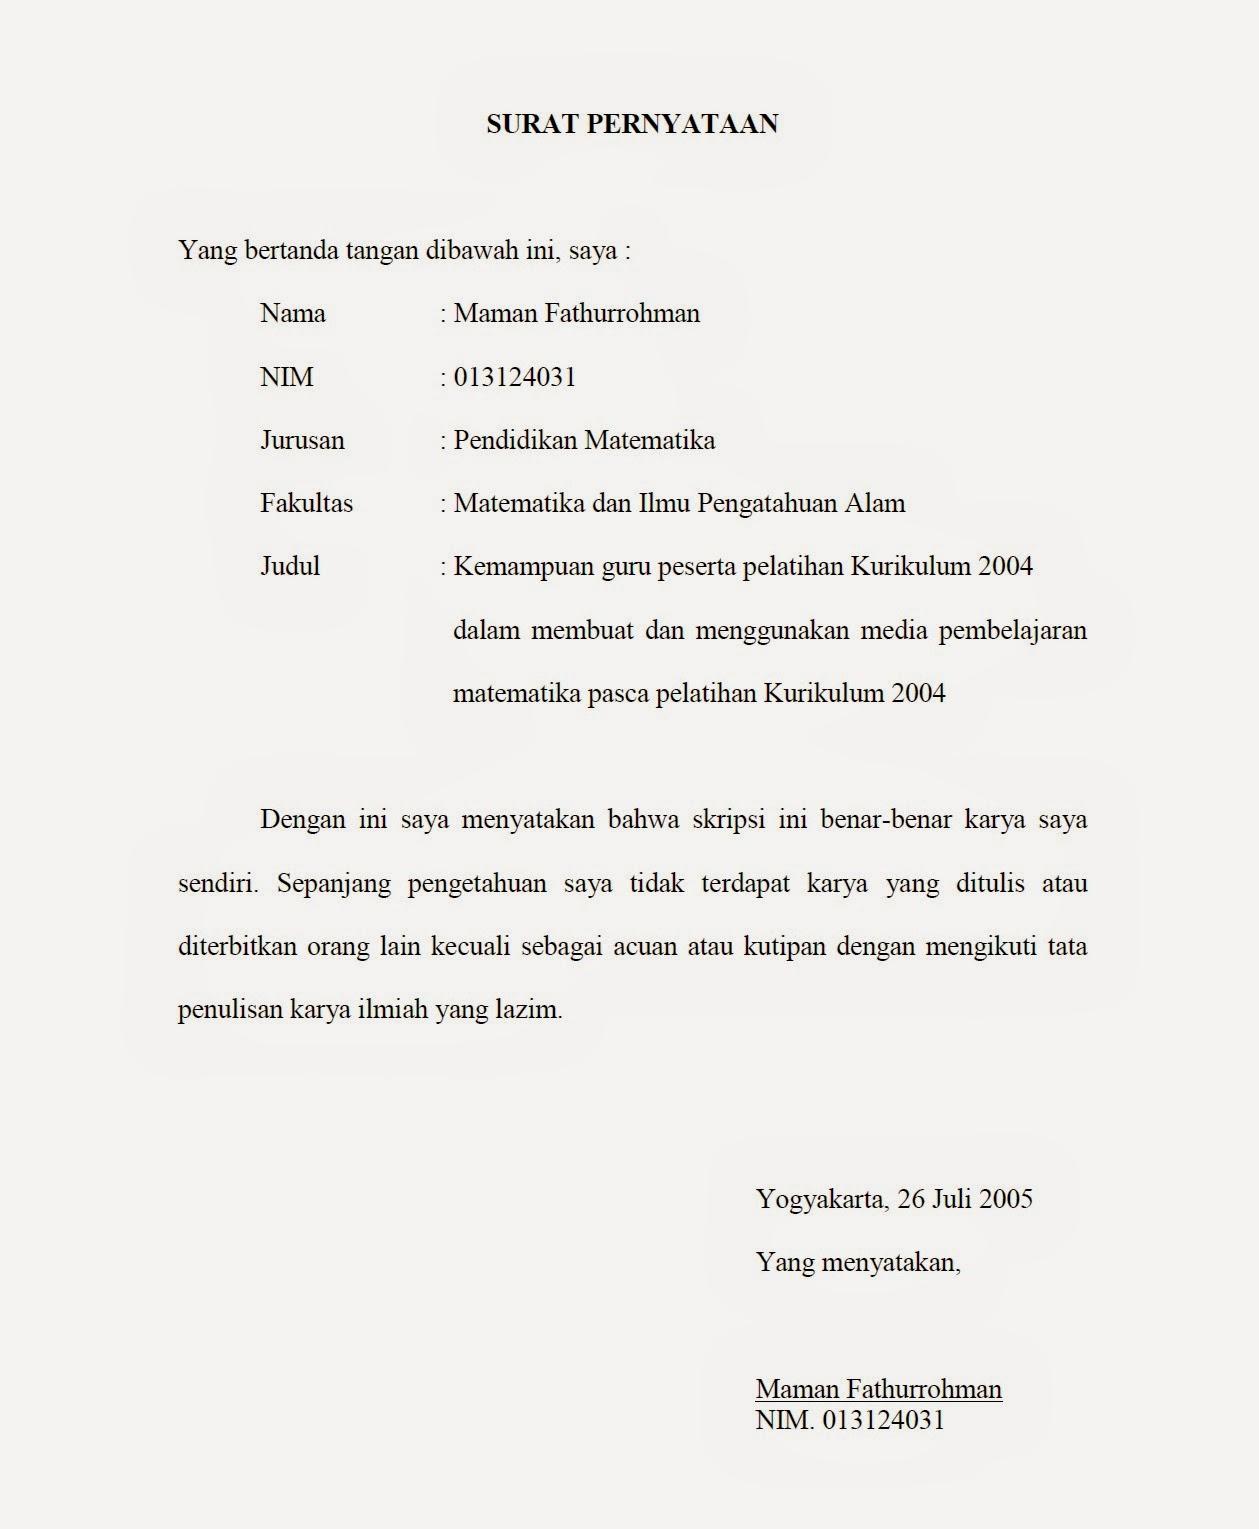 Contoh surat pernyataan skripsi